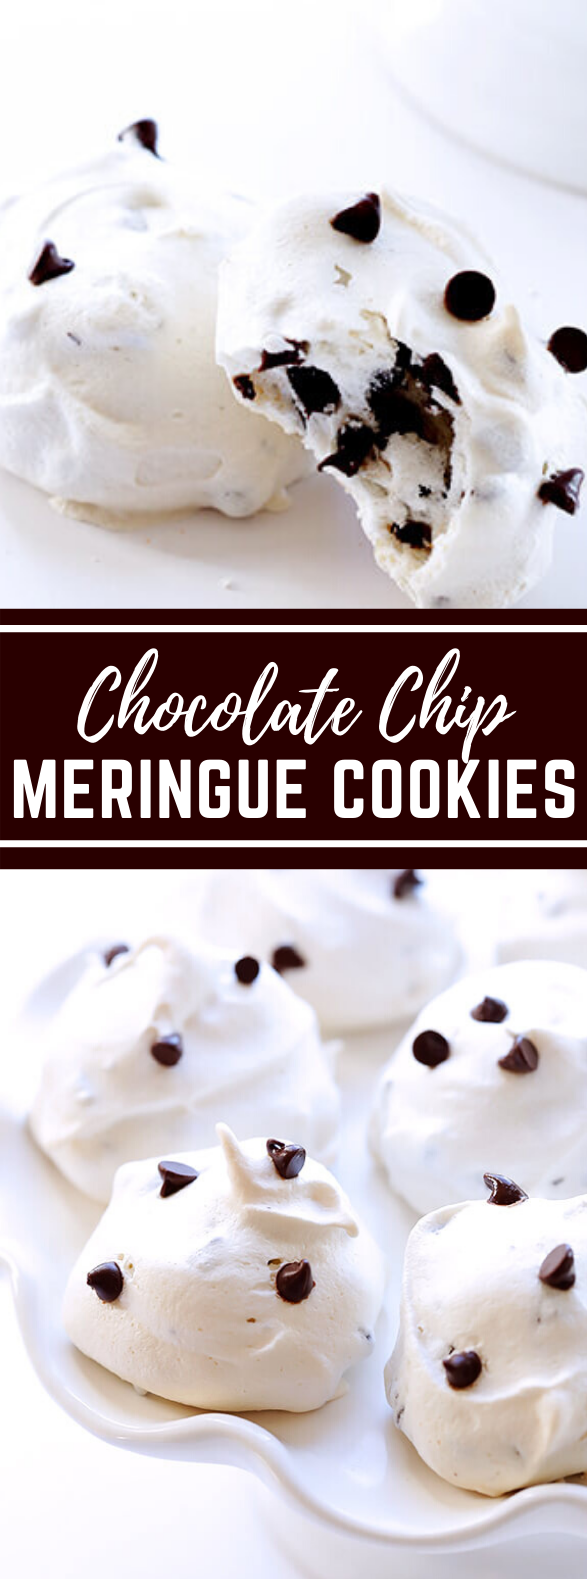 35-CALORIE CHOCOLATE CHIP MERINGUE COOKIES #desserts #deliciousrecipe